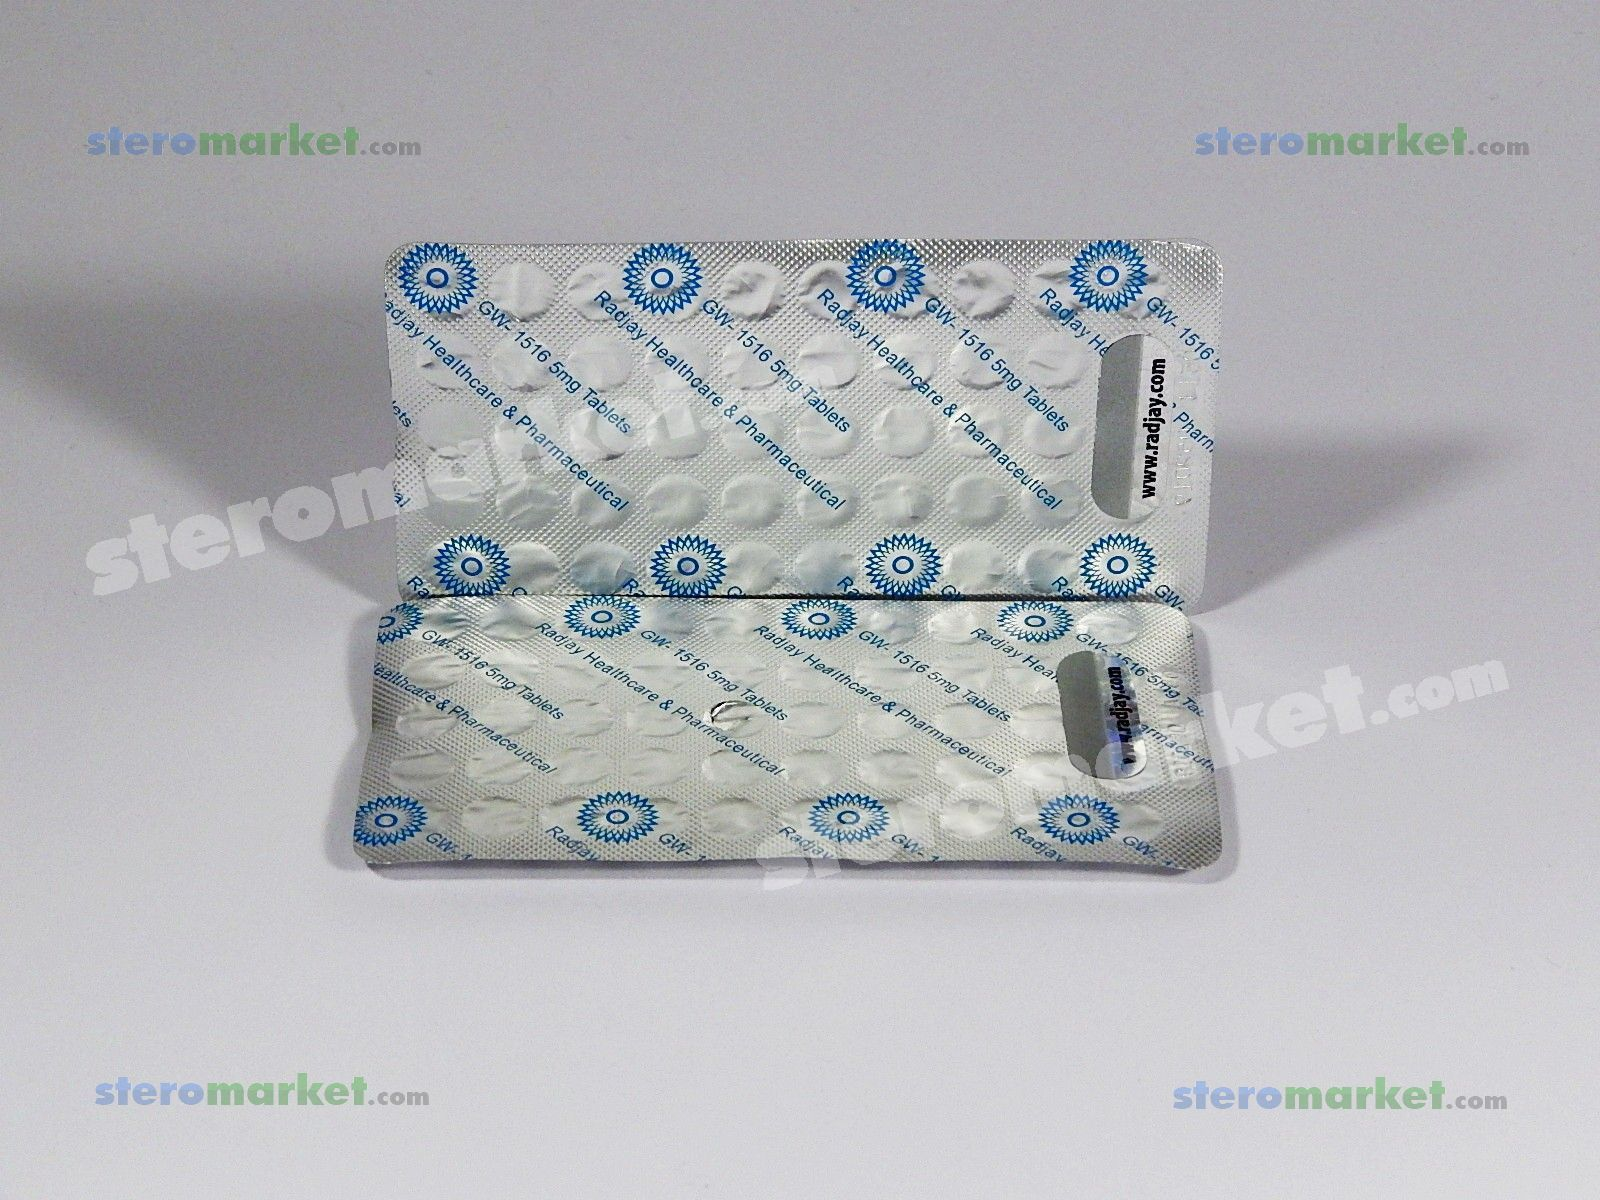 Radjay GW-1516 100 tabs Buy Online • USA • for SALE